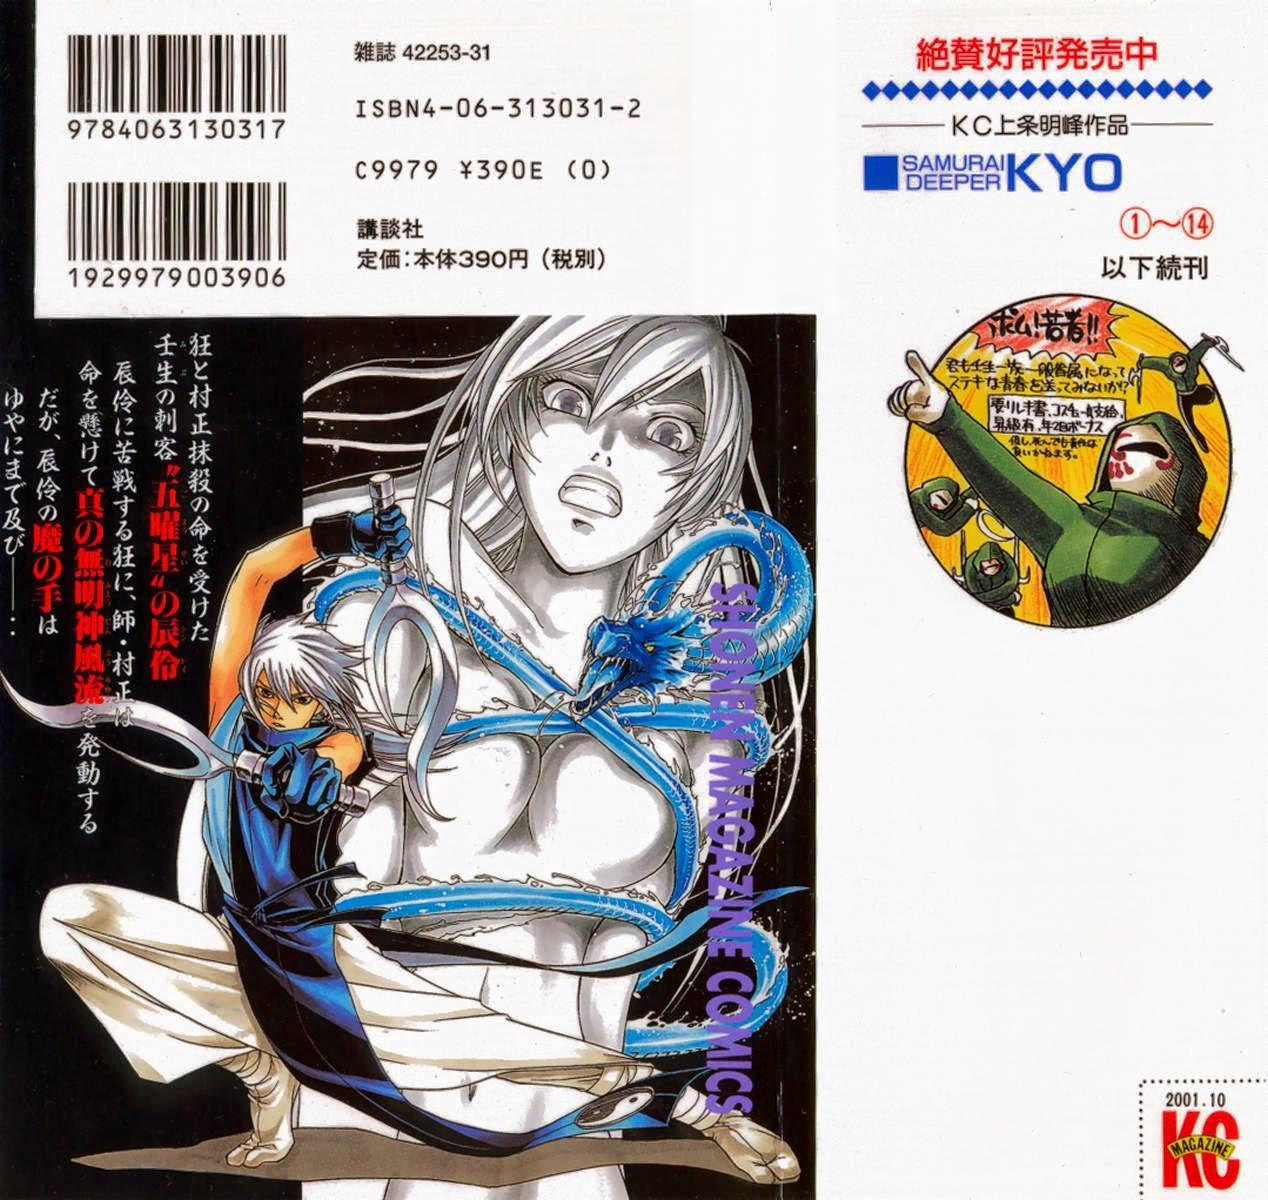 Mắt Quỷ Kyo-Samurai Deeper Kyo chap 91 Trang 3